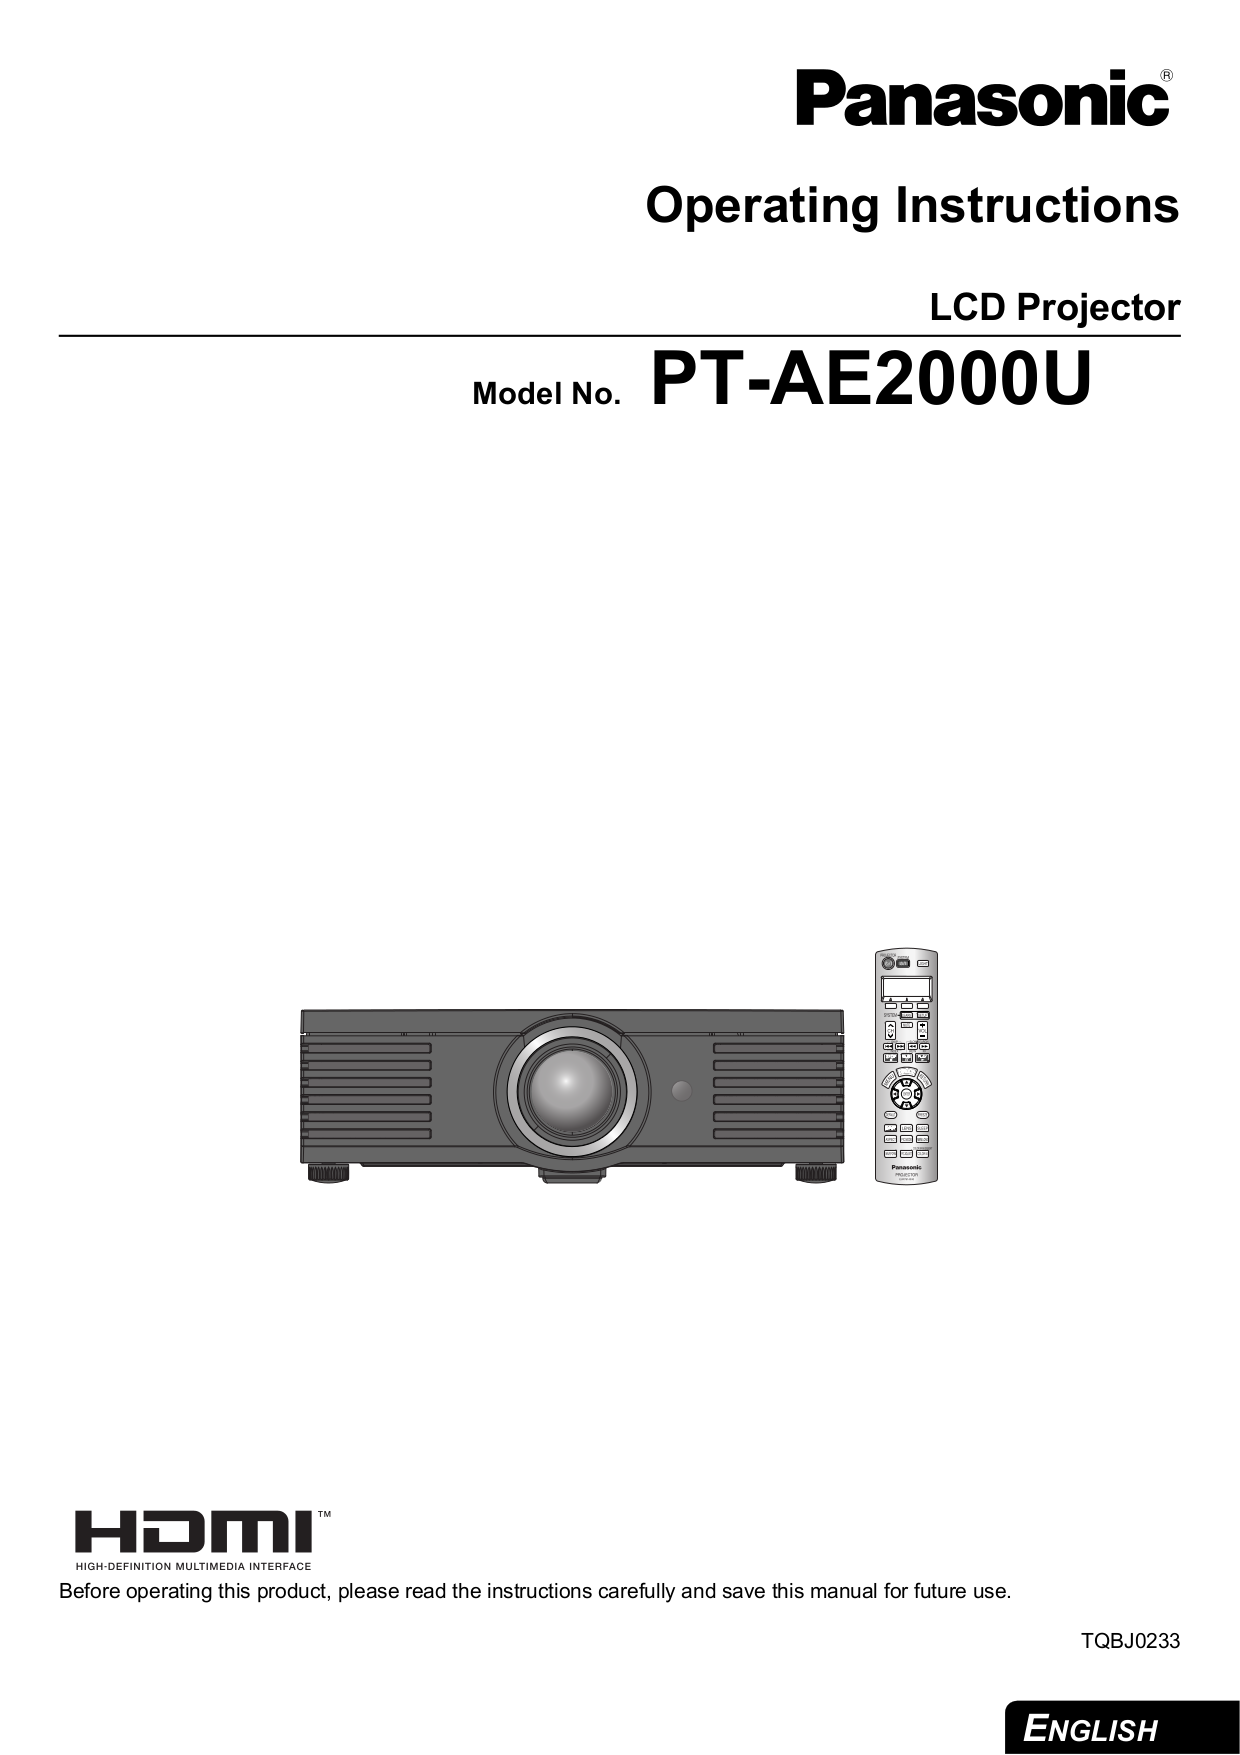 Panasonic PT-LX270 Projector Lamp Module